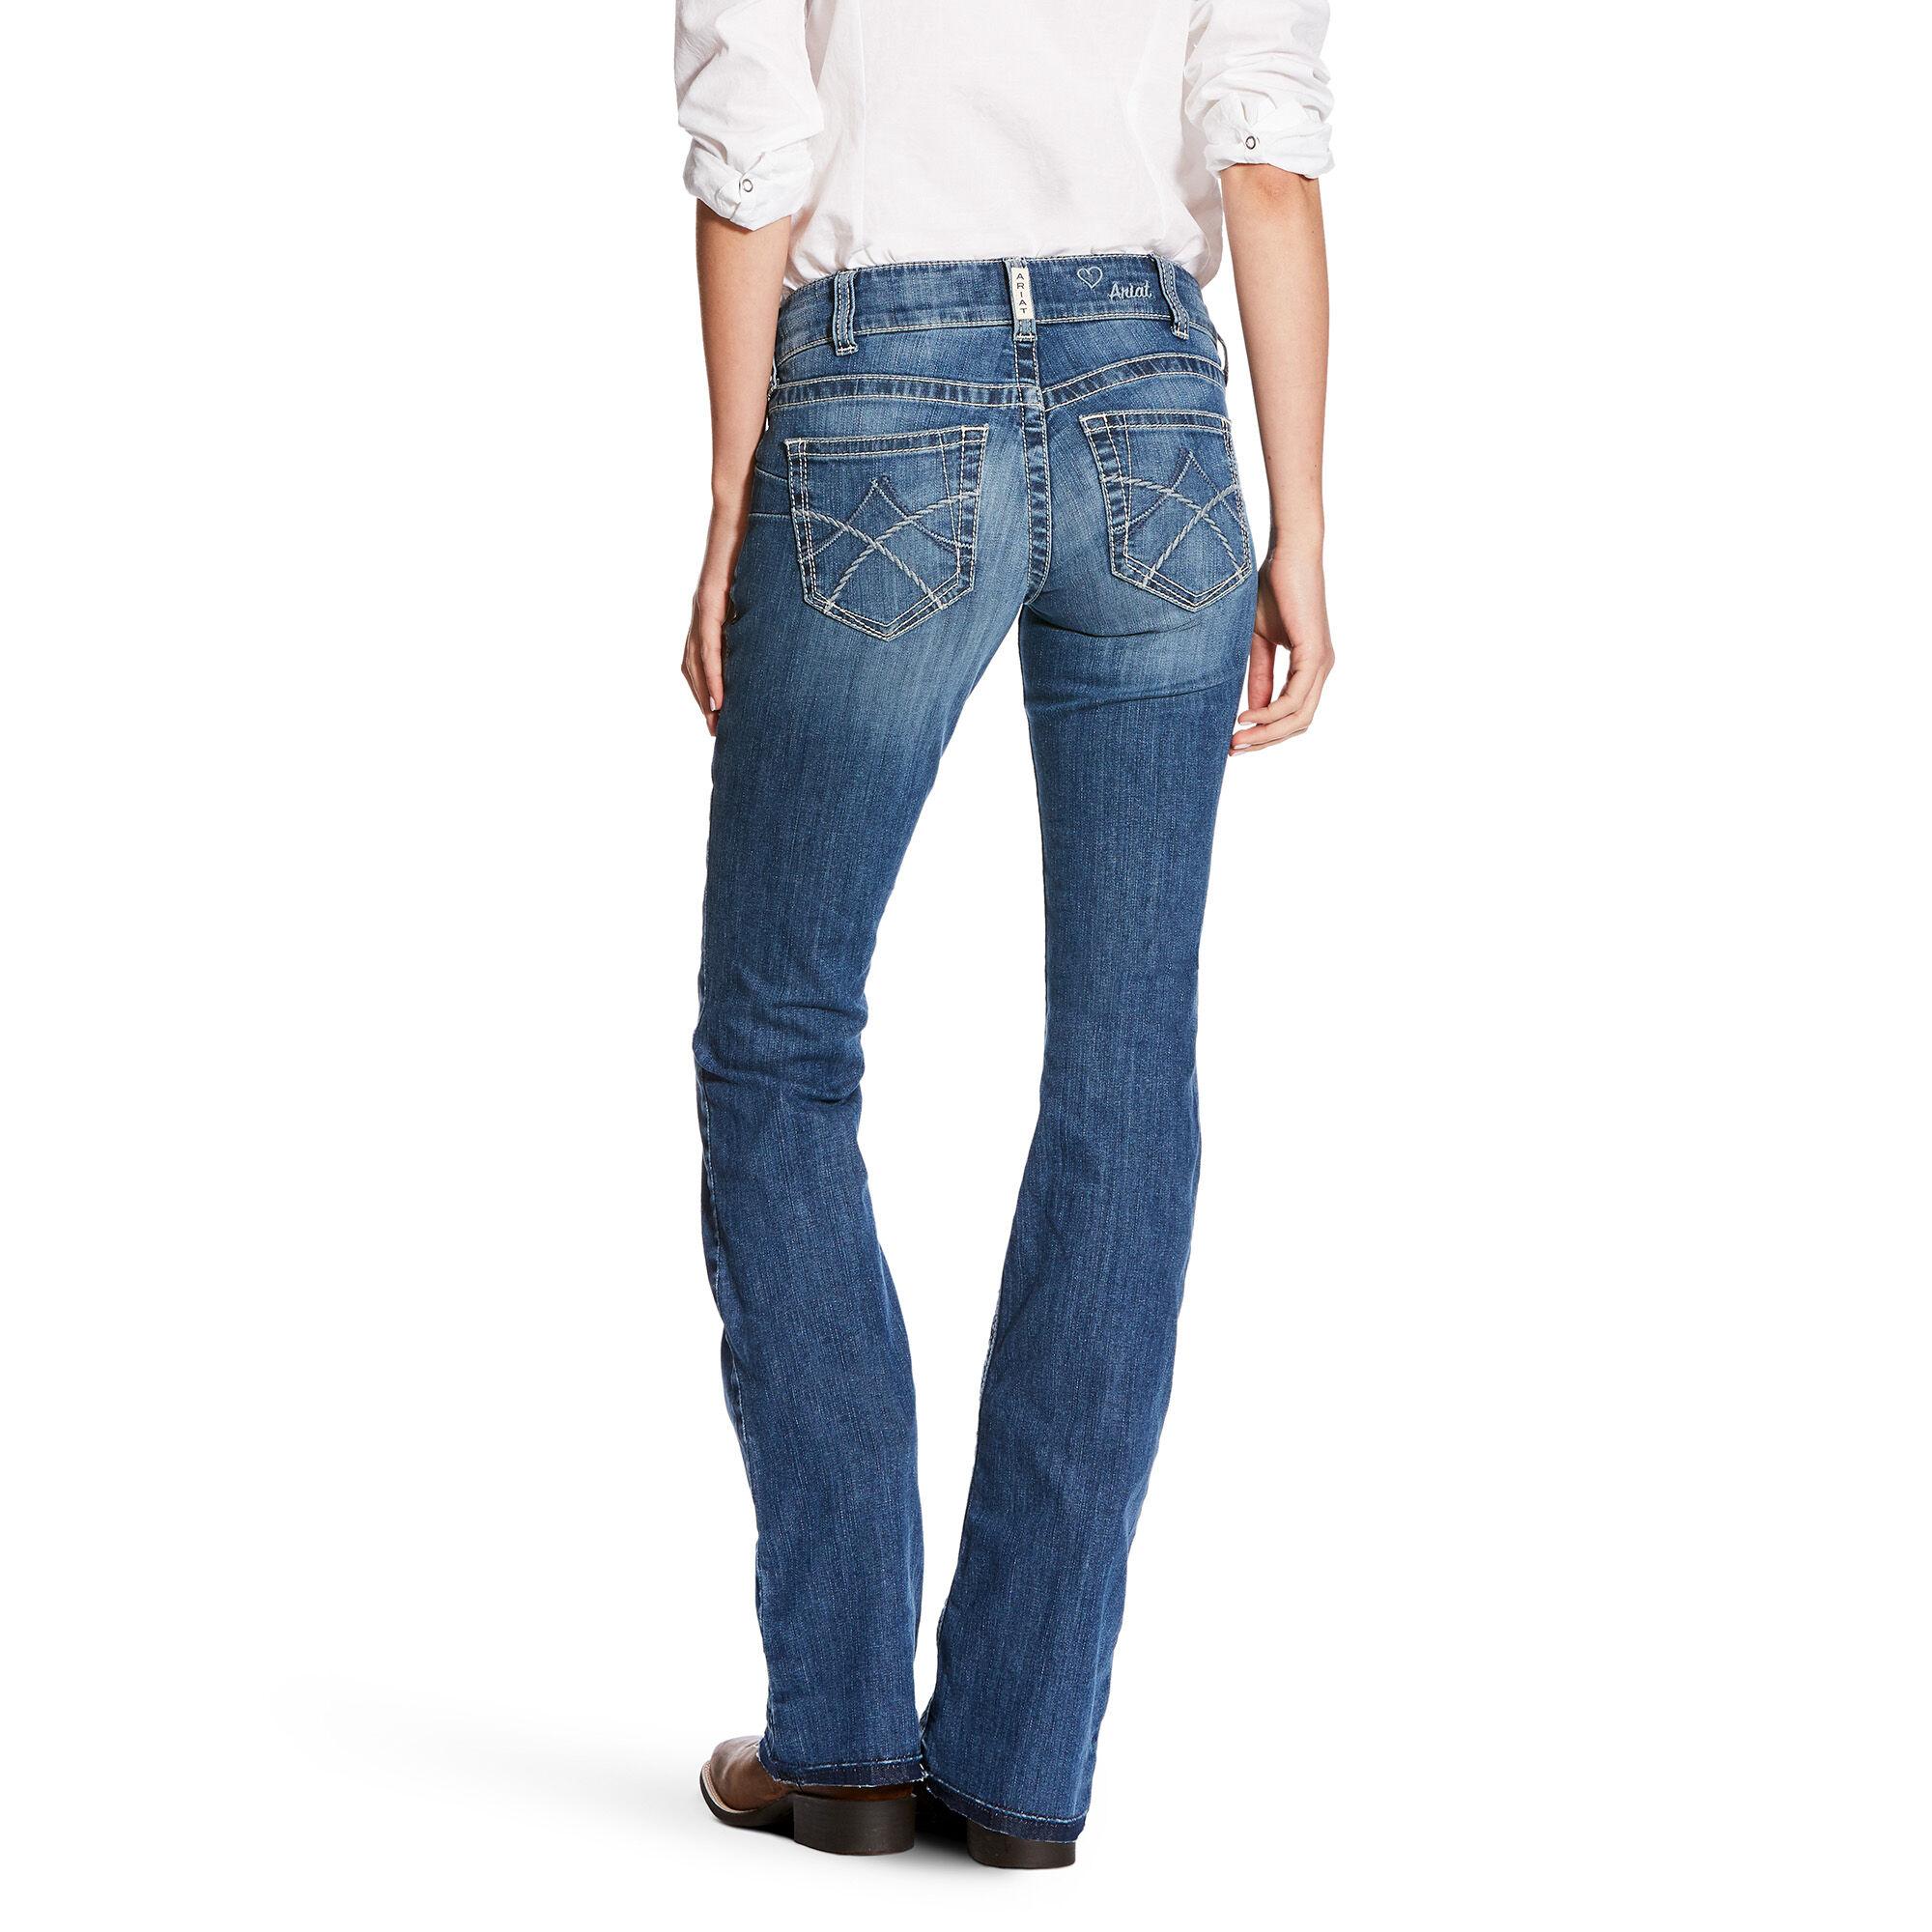 98907f1e4a7f R.E.A.L Mid Rise Jasmine Boot Cut Jean